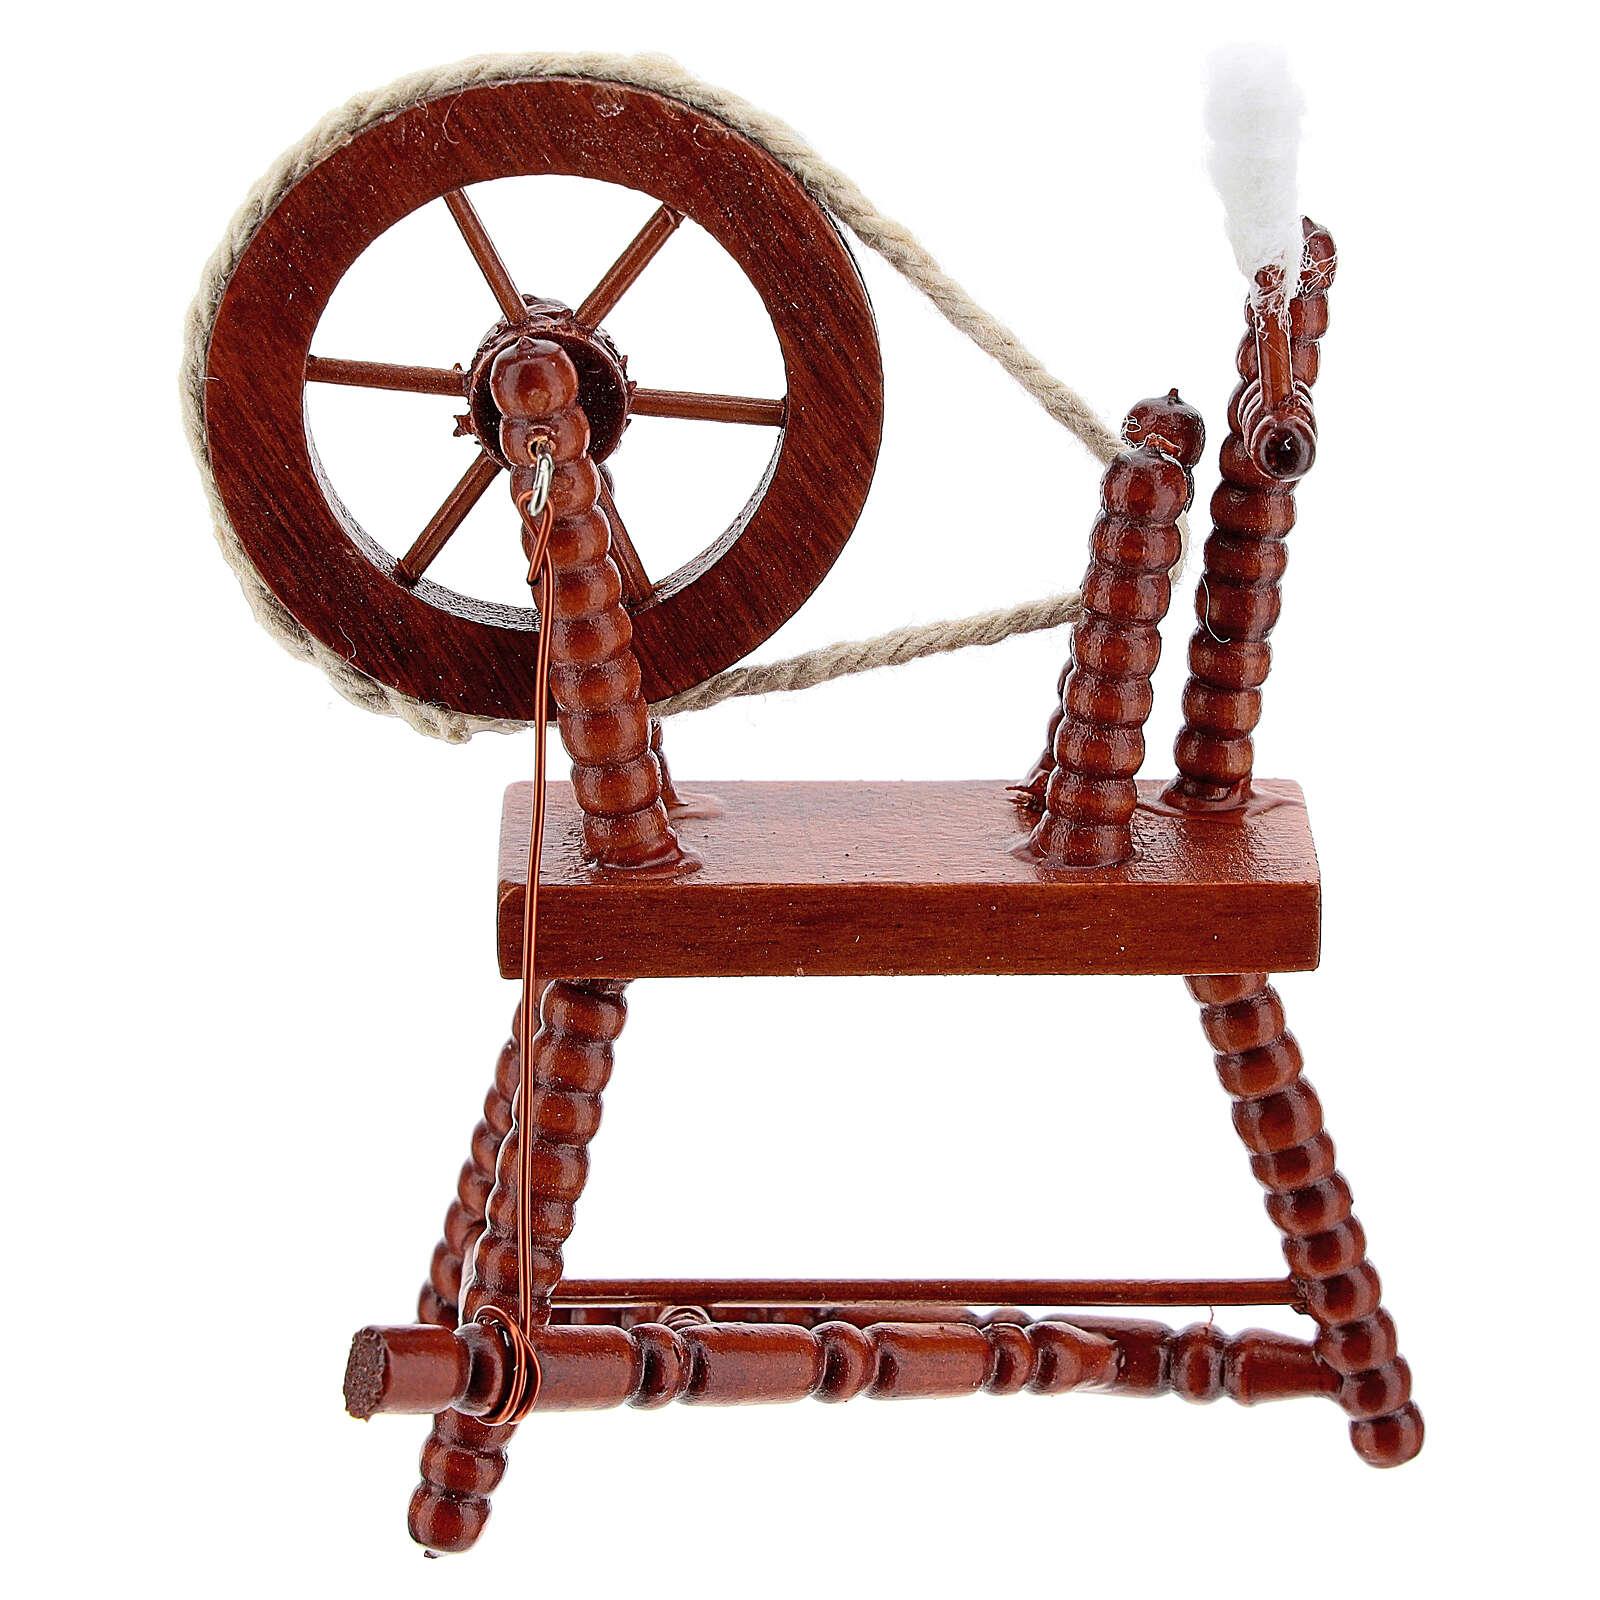 Macchina fila lana mogano presepe 10 cm 4